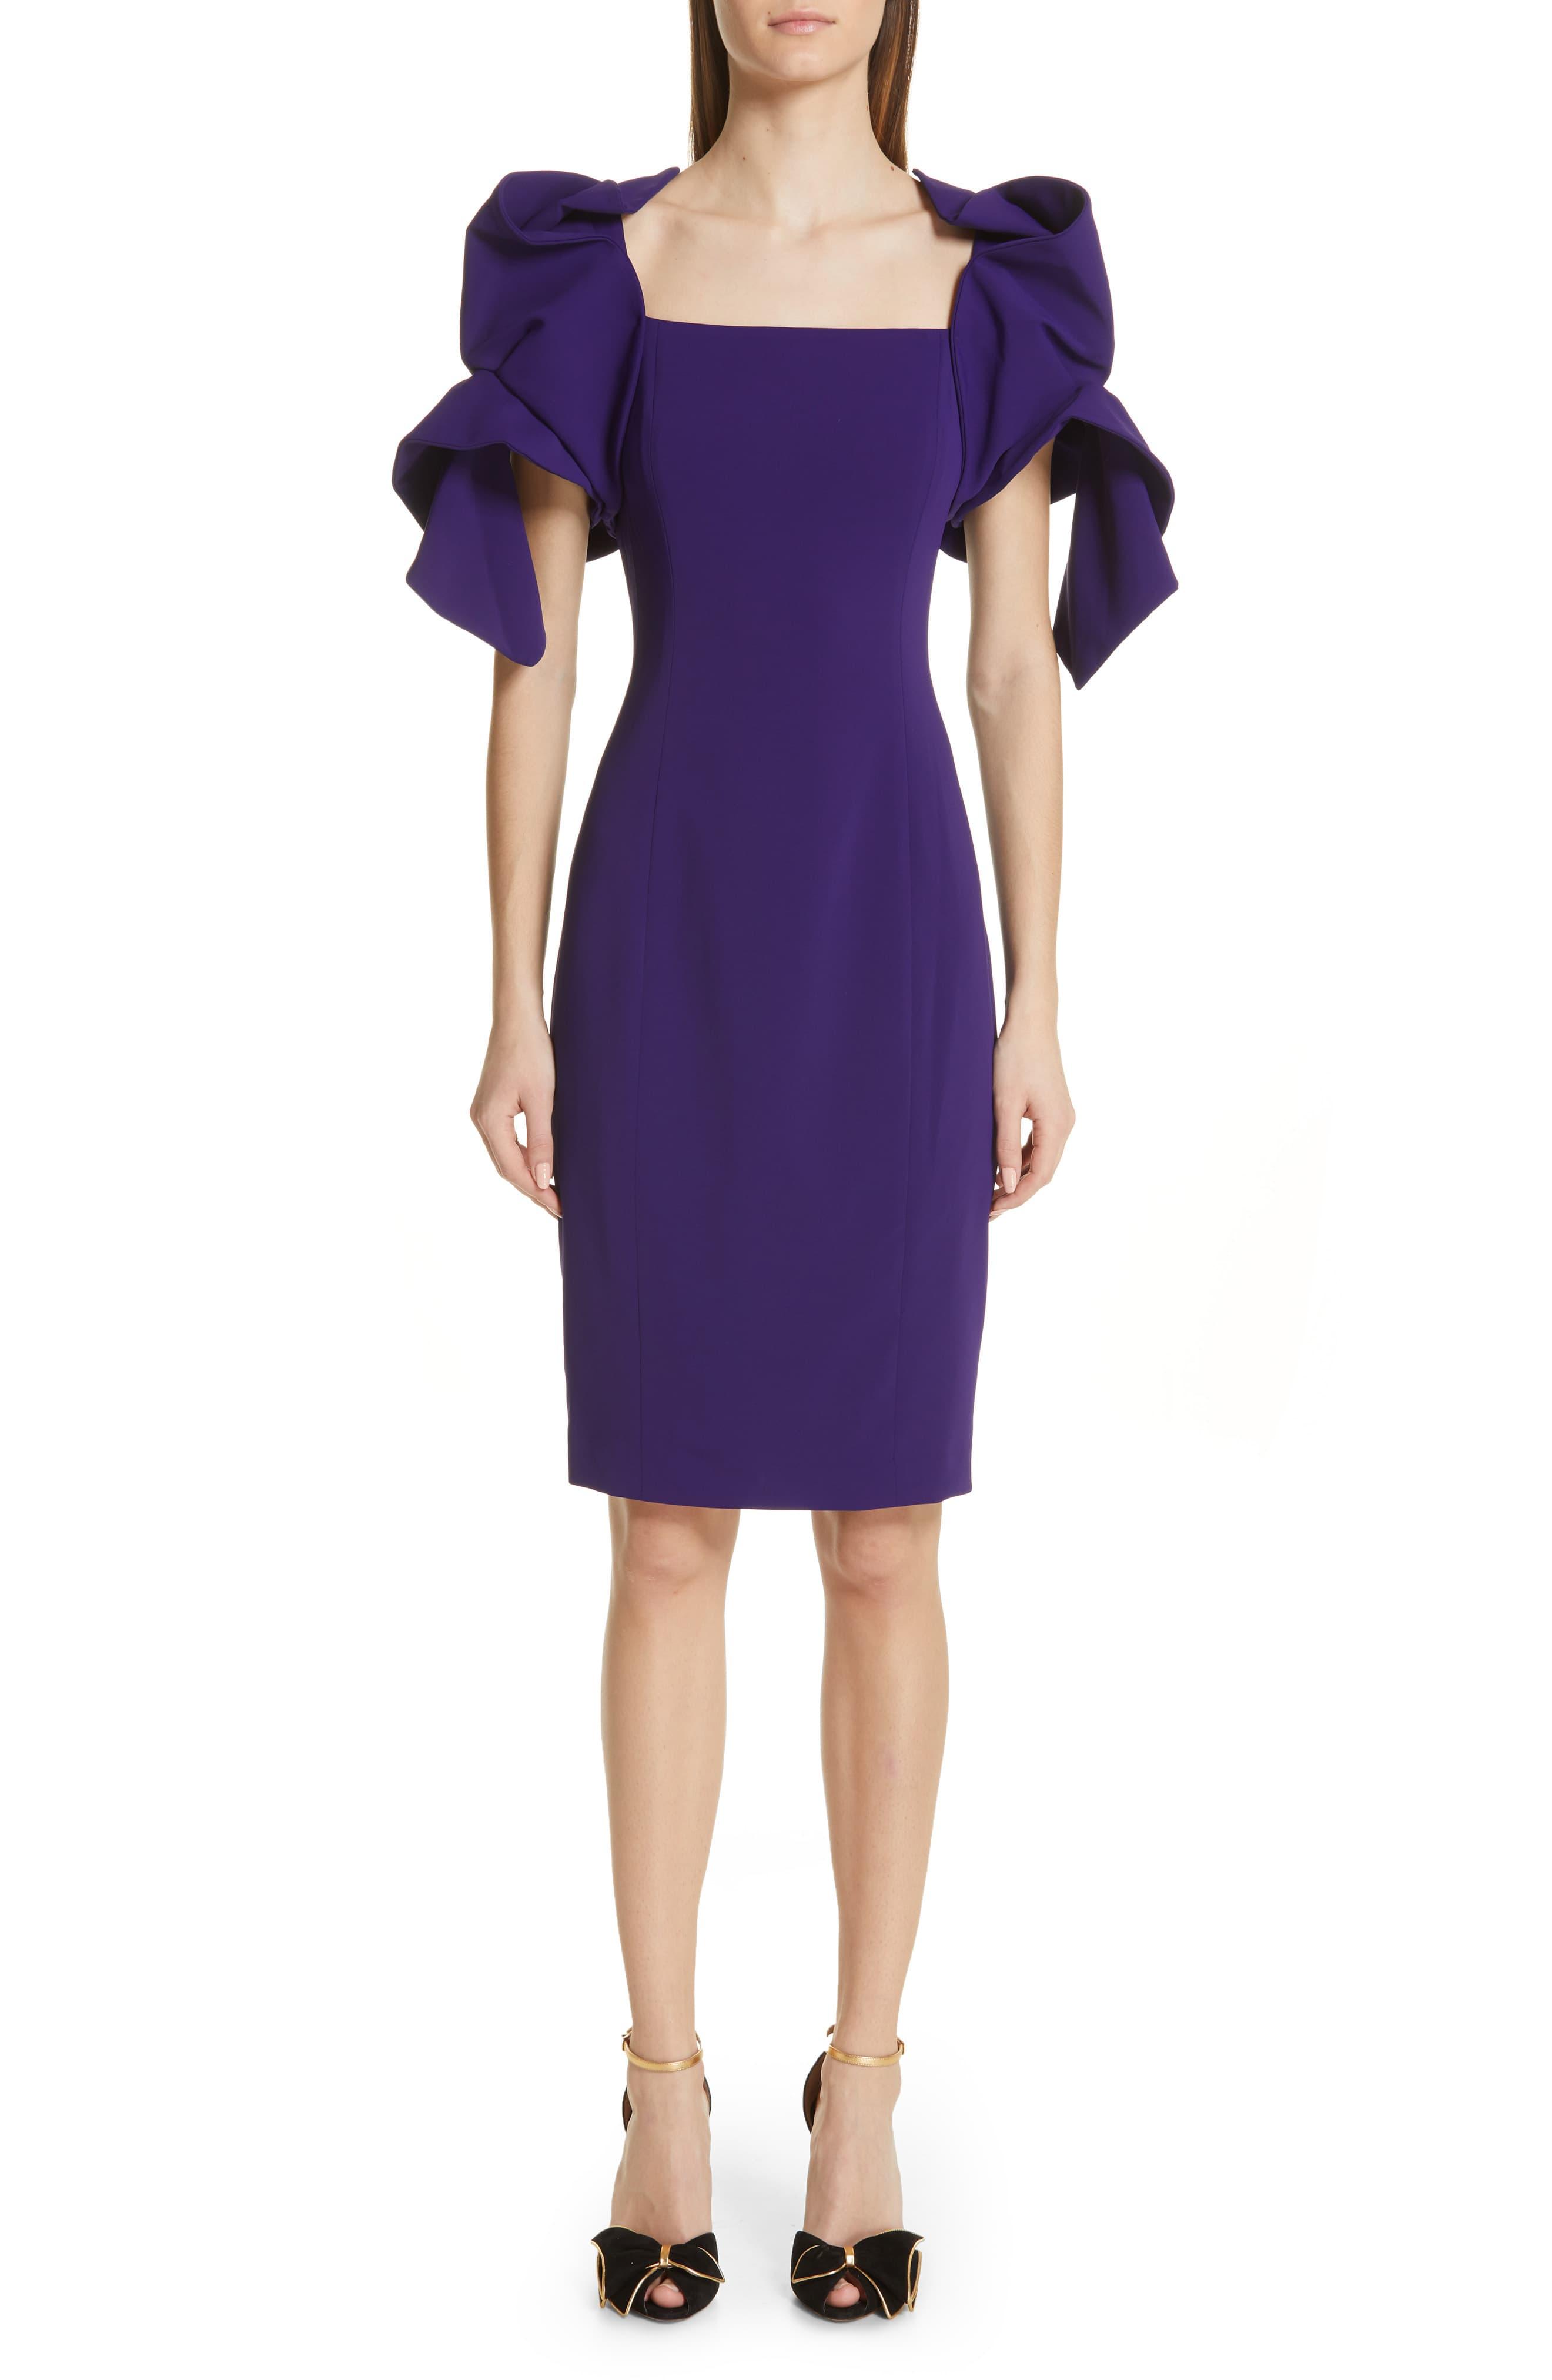 Complicated Dress Models Evening Dresses Fancy Dresses Gowns Dresses [ 1104 x 736 Pixel ]